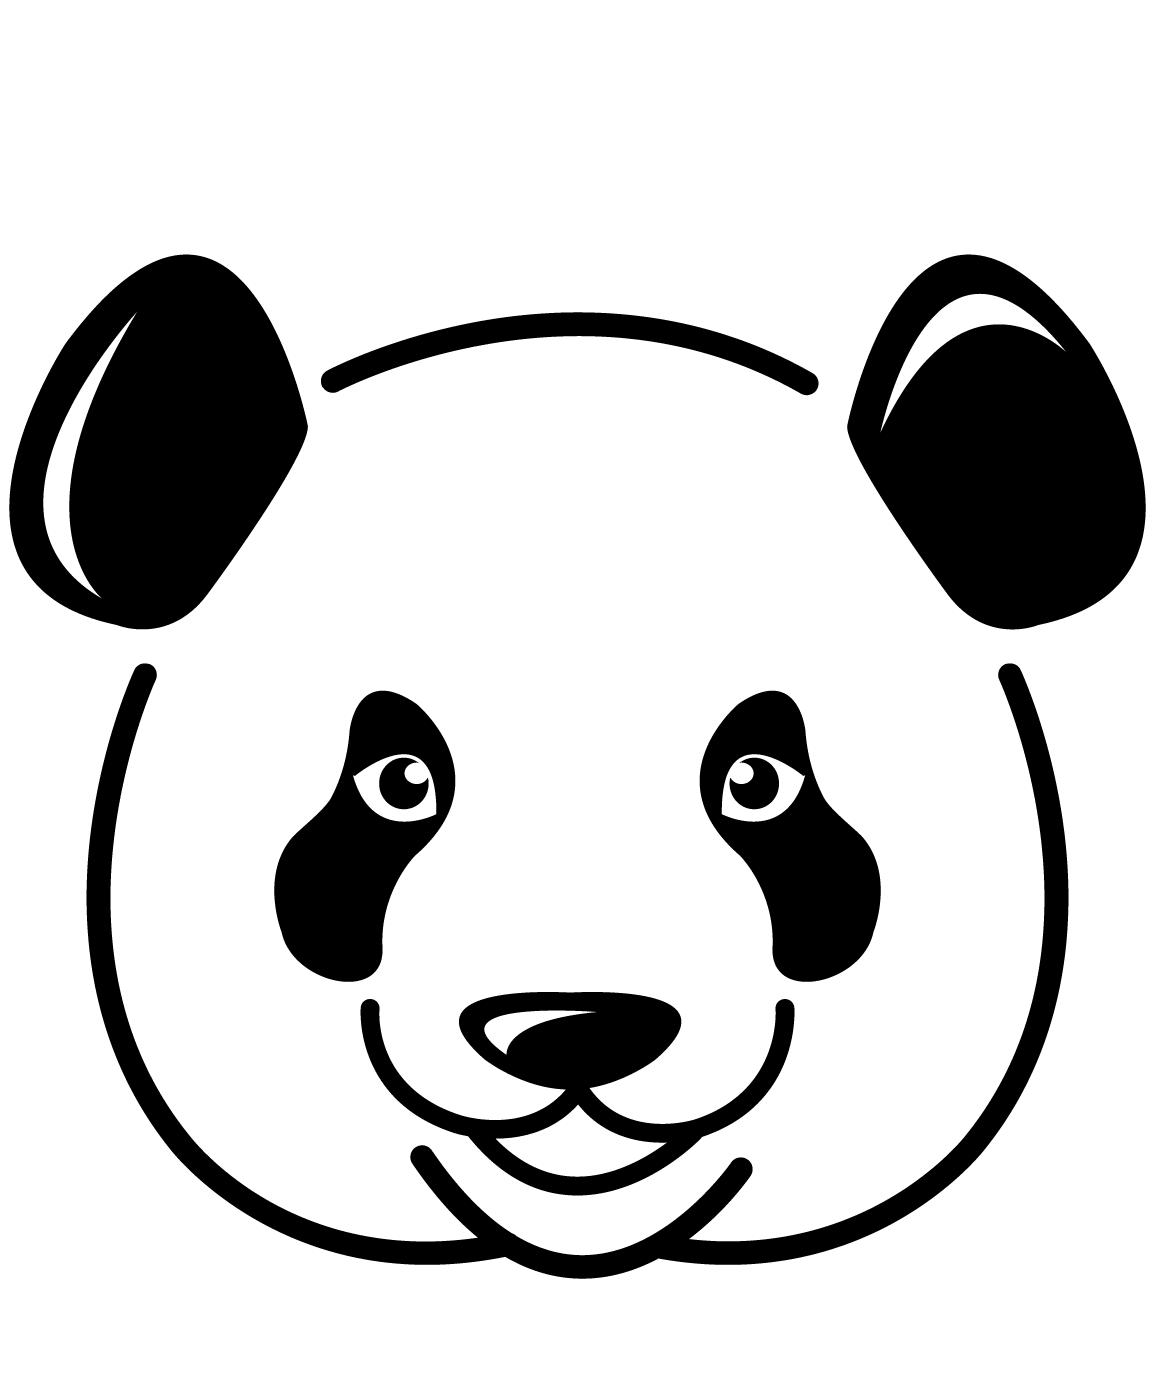 Panda Face Coloring Page